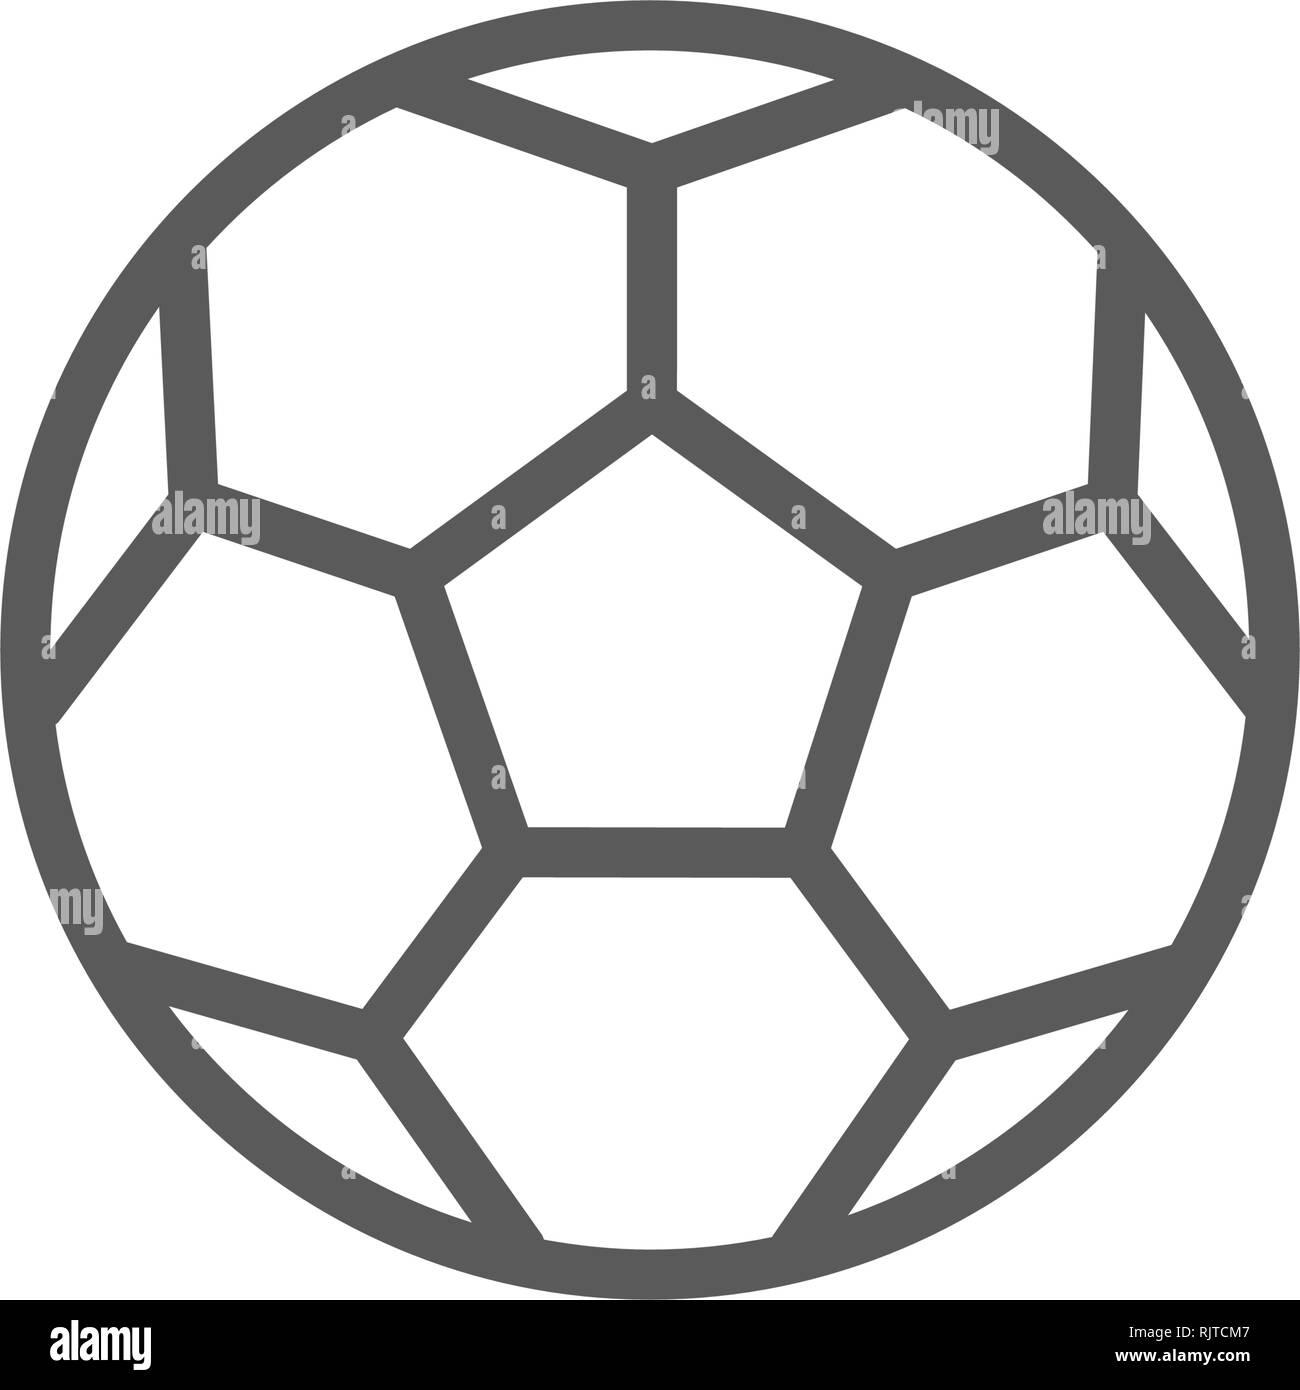 Fussball Symbol Vektor Abbildung Bild 235335415 Alamy